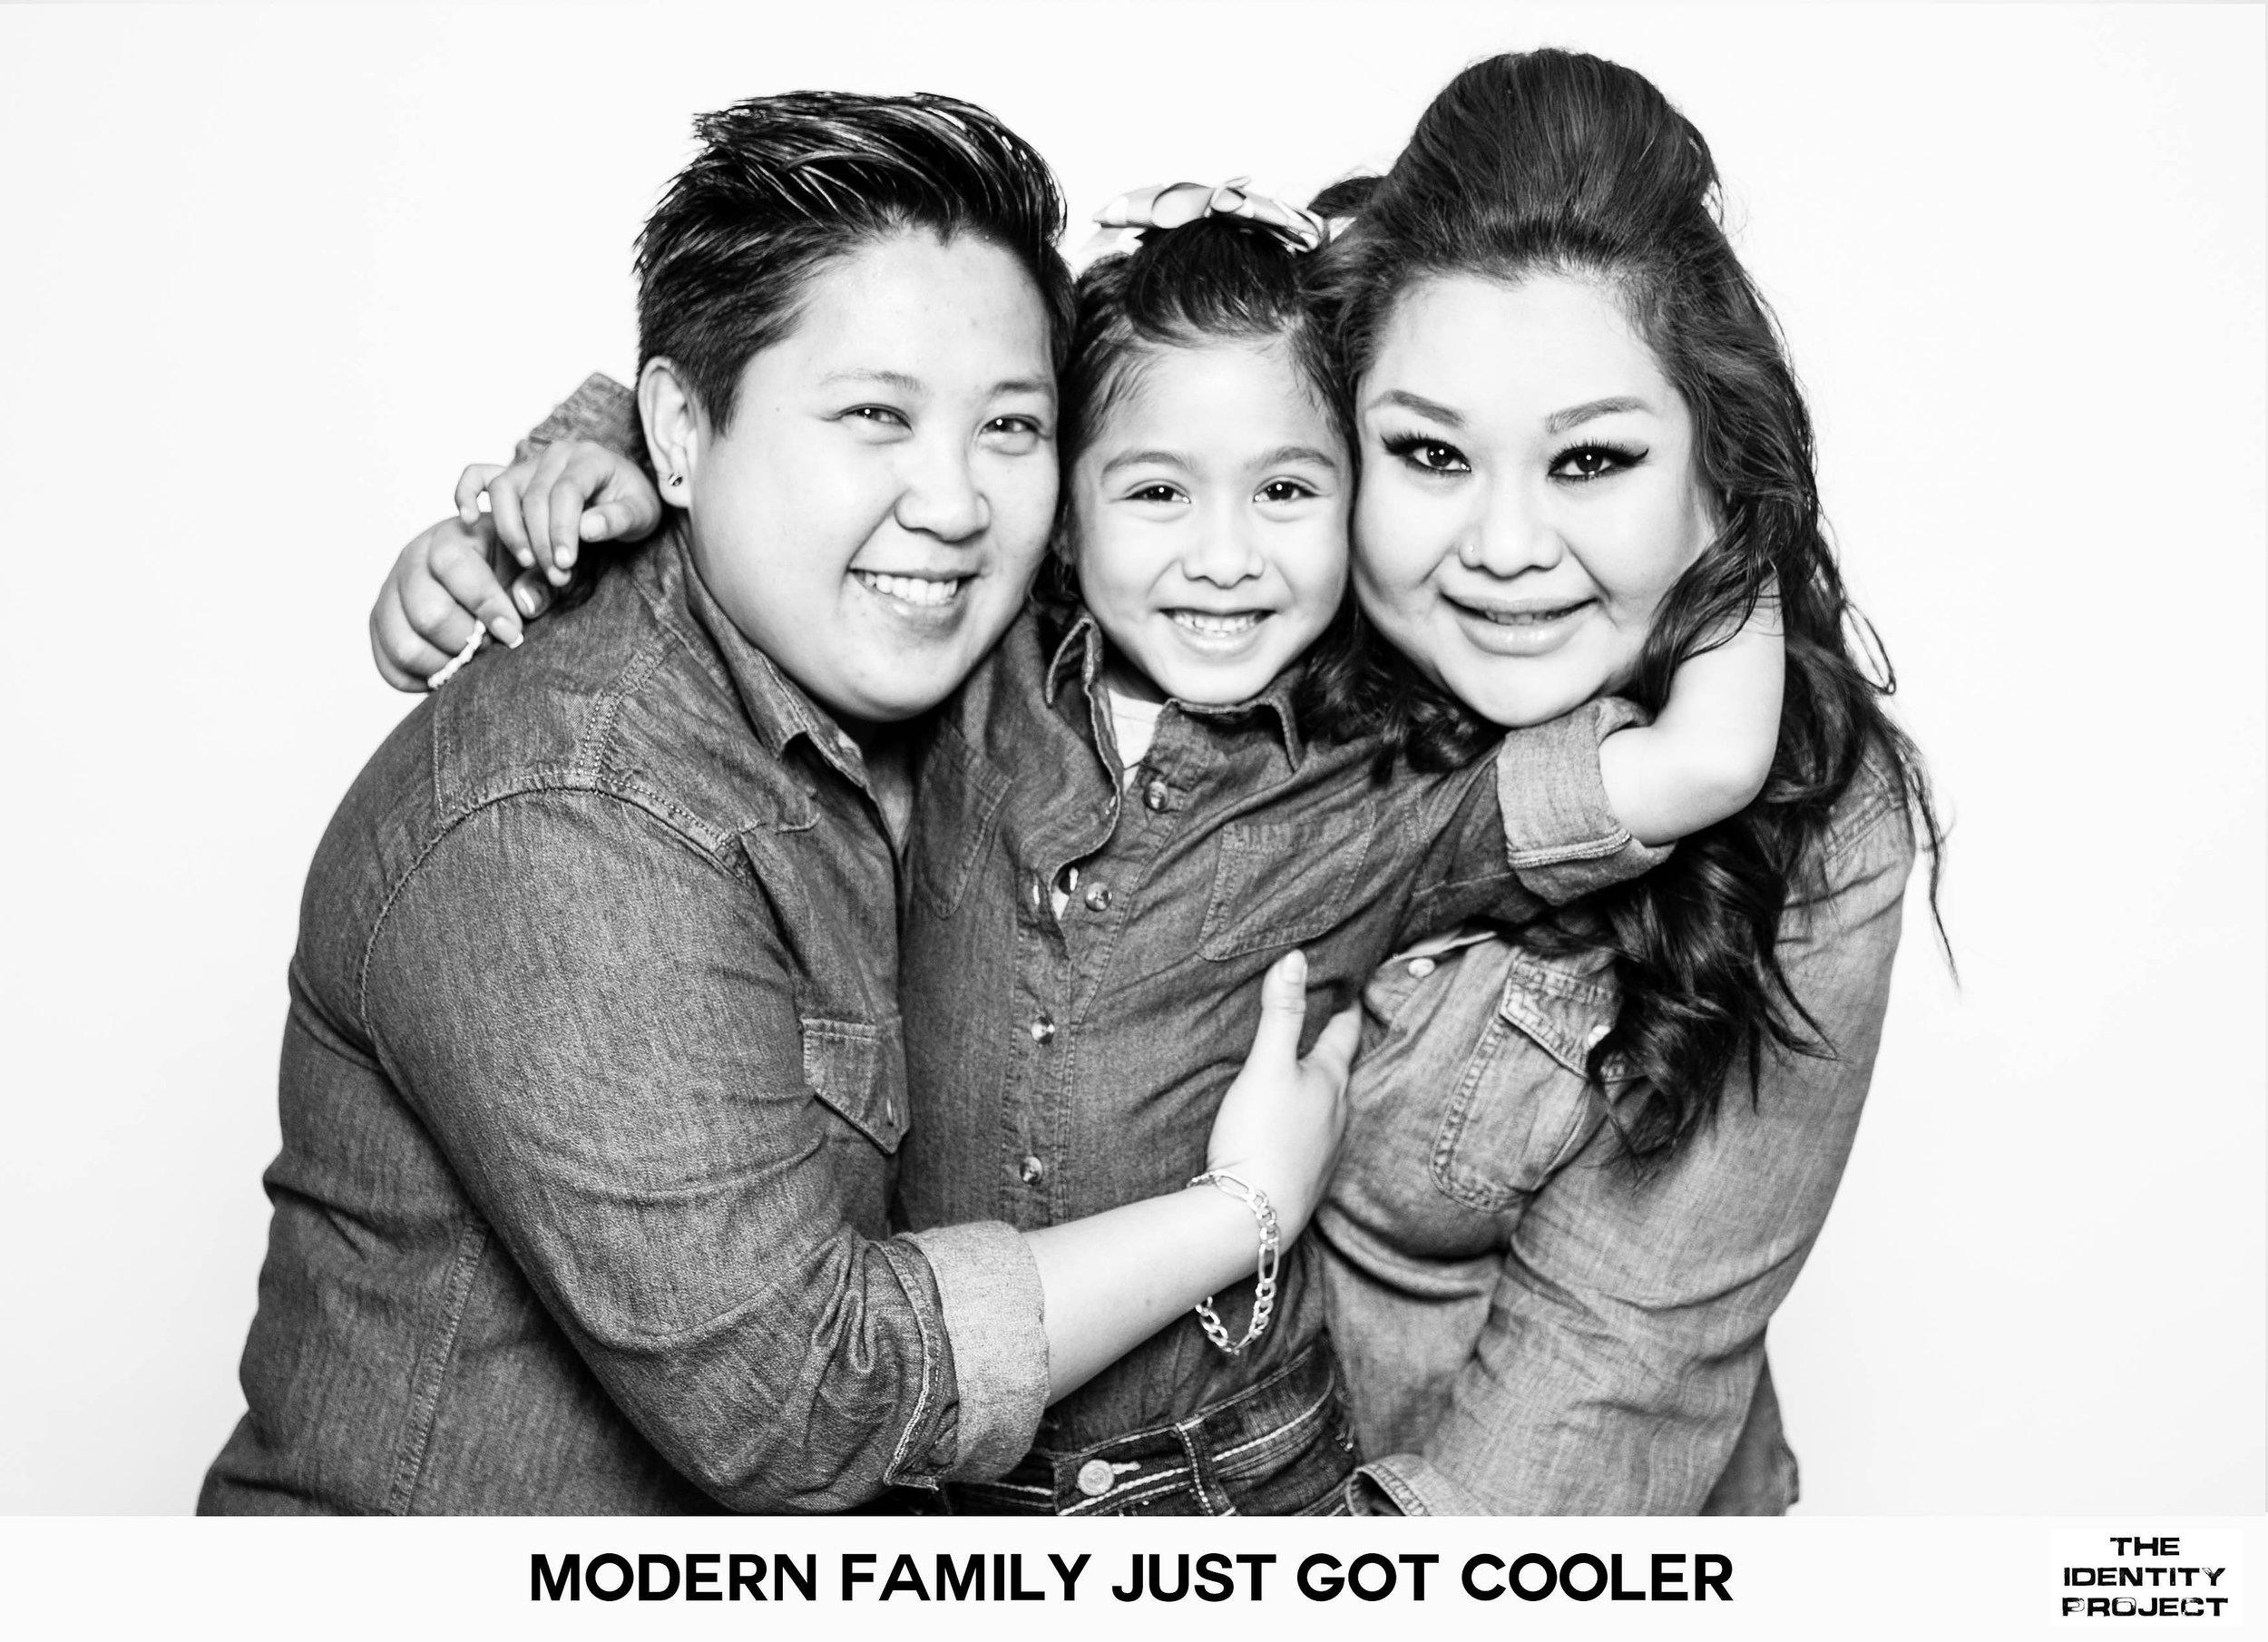 modernfamilyjustgotcooler.jpg